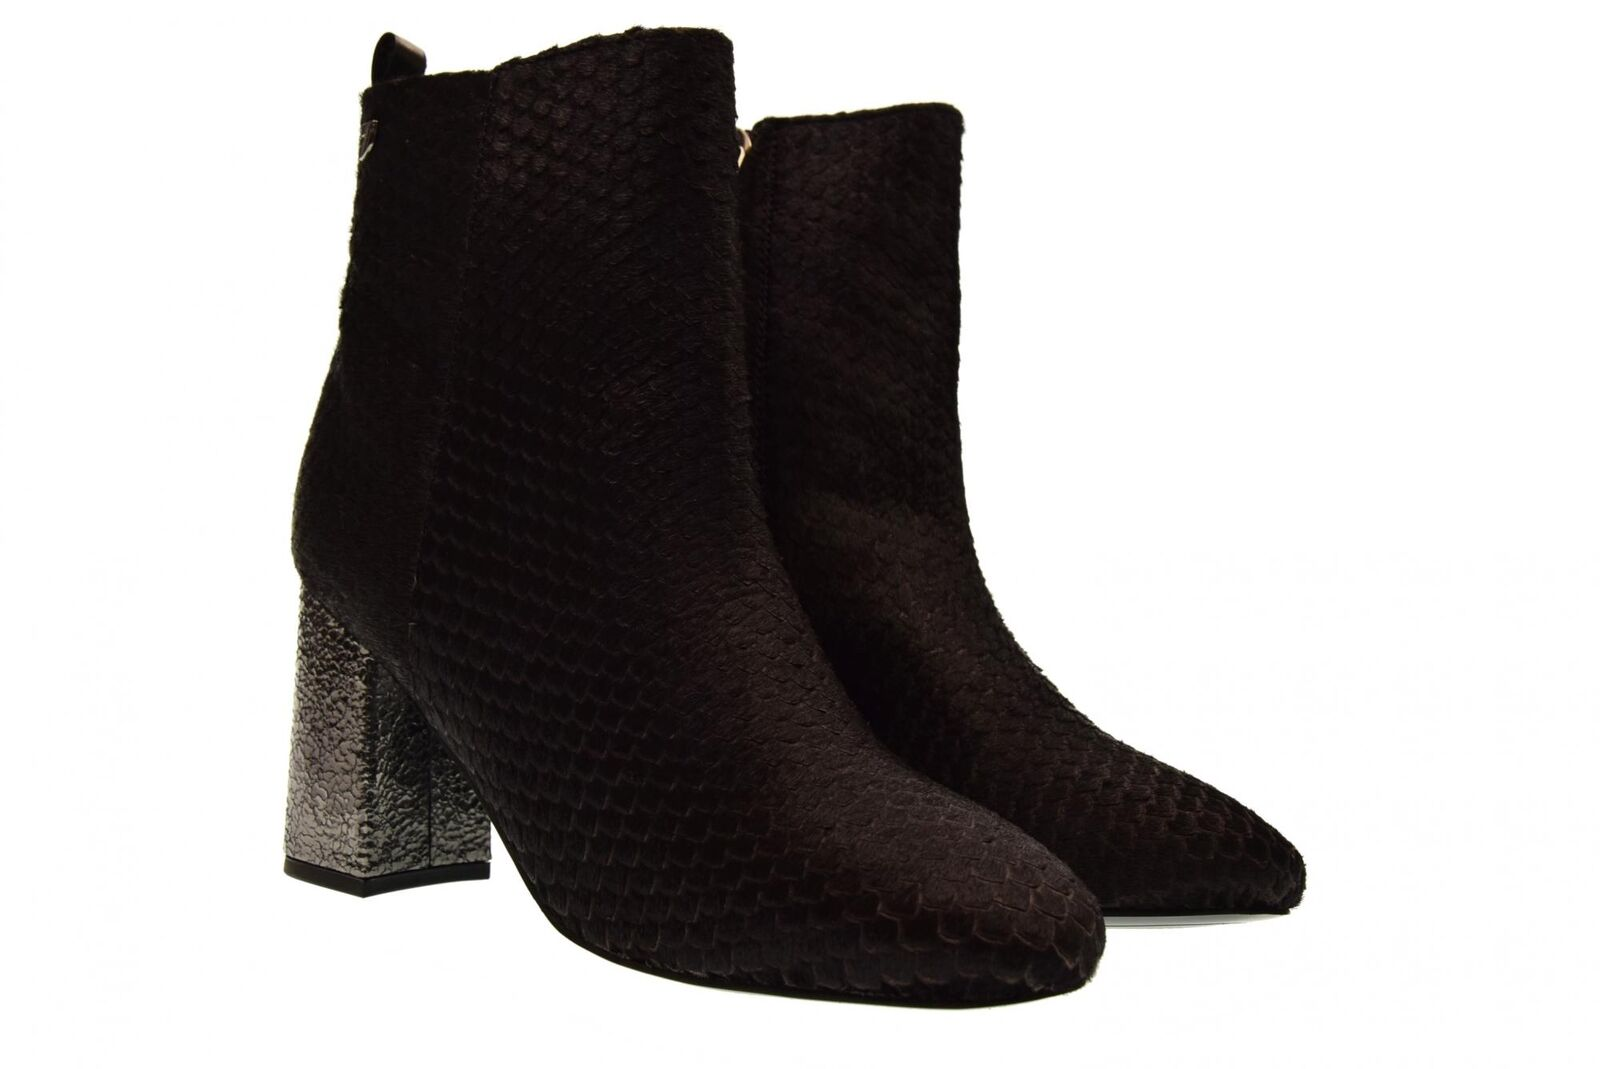 Gioseppo A18f zapatos femme bottines 46237 talon moyen fermeture éclair